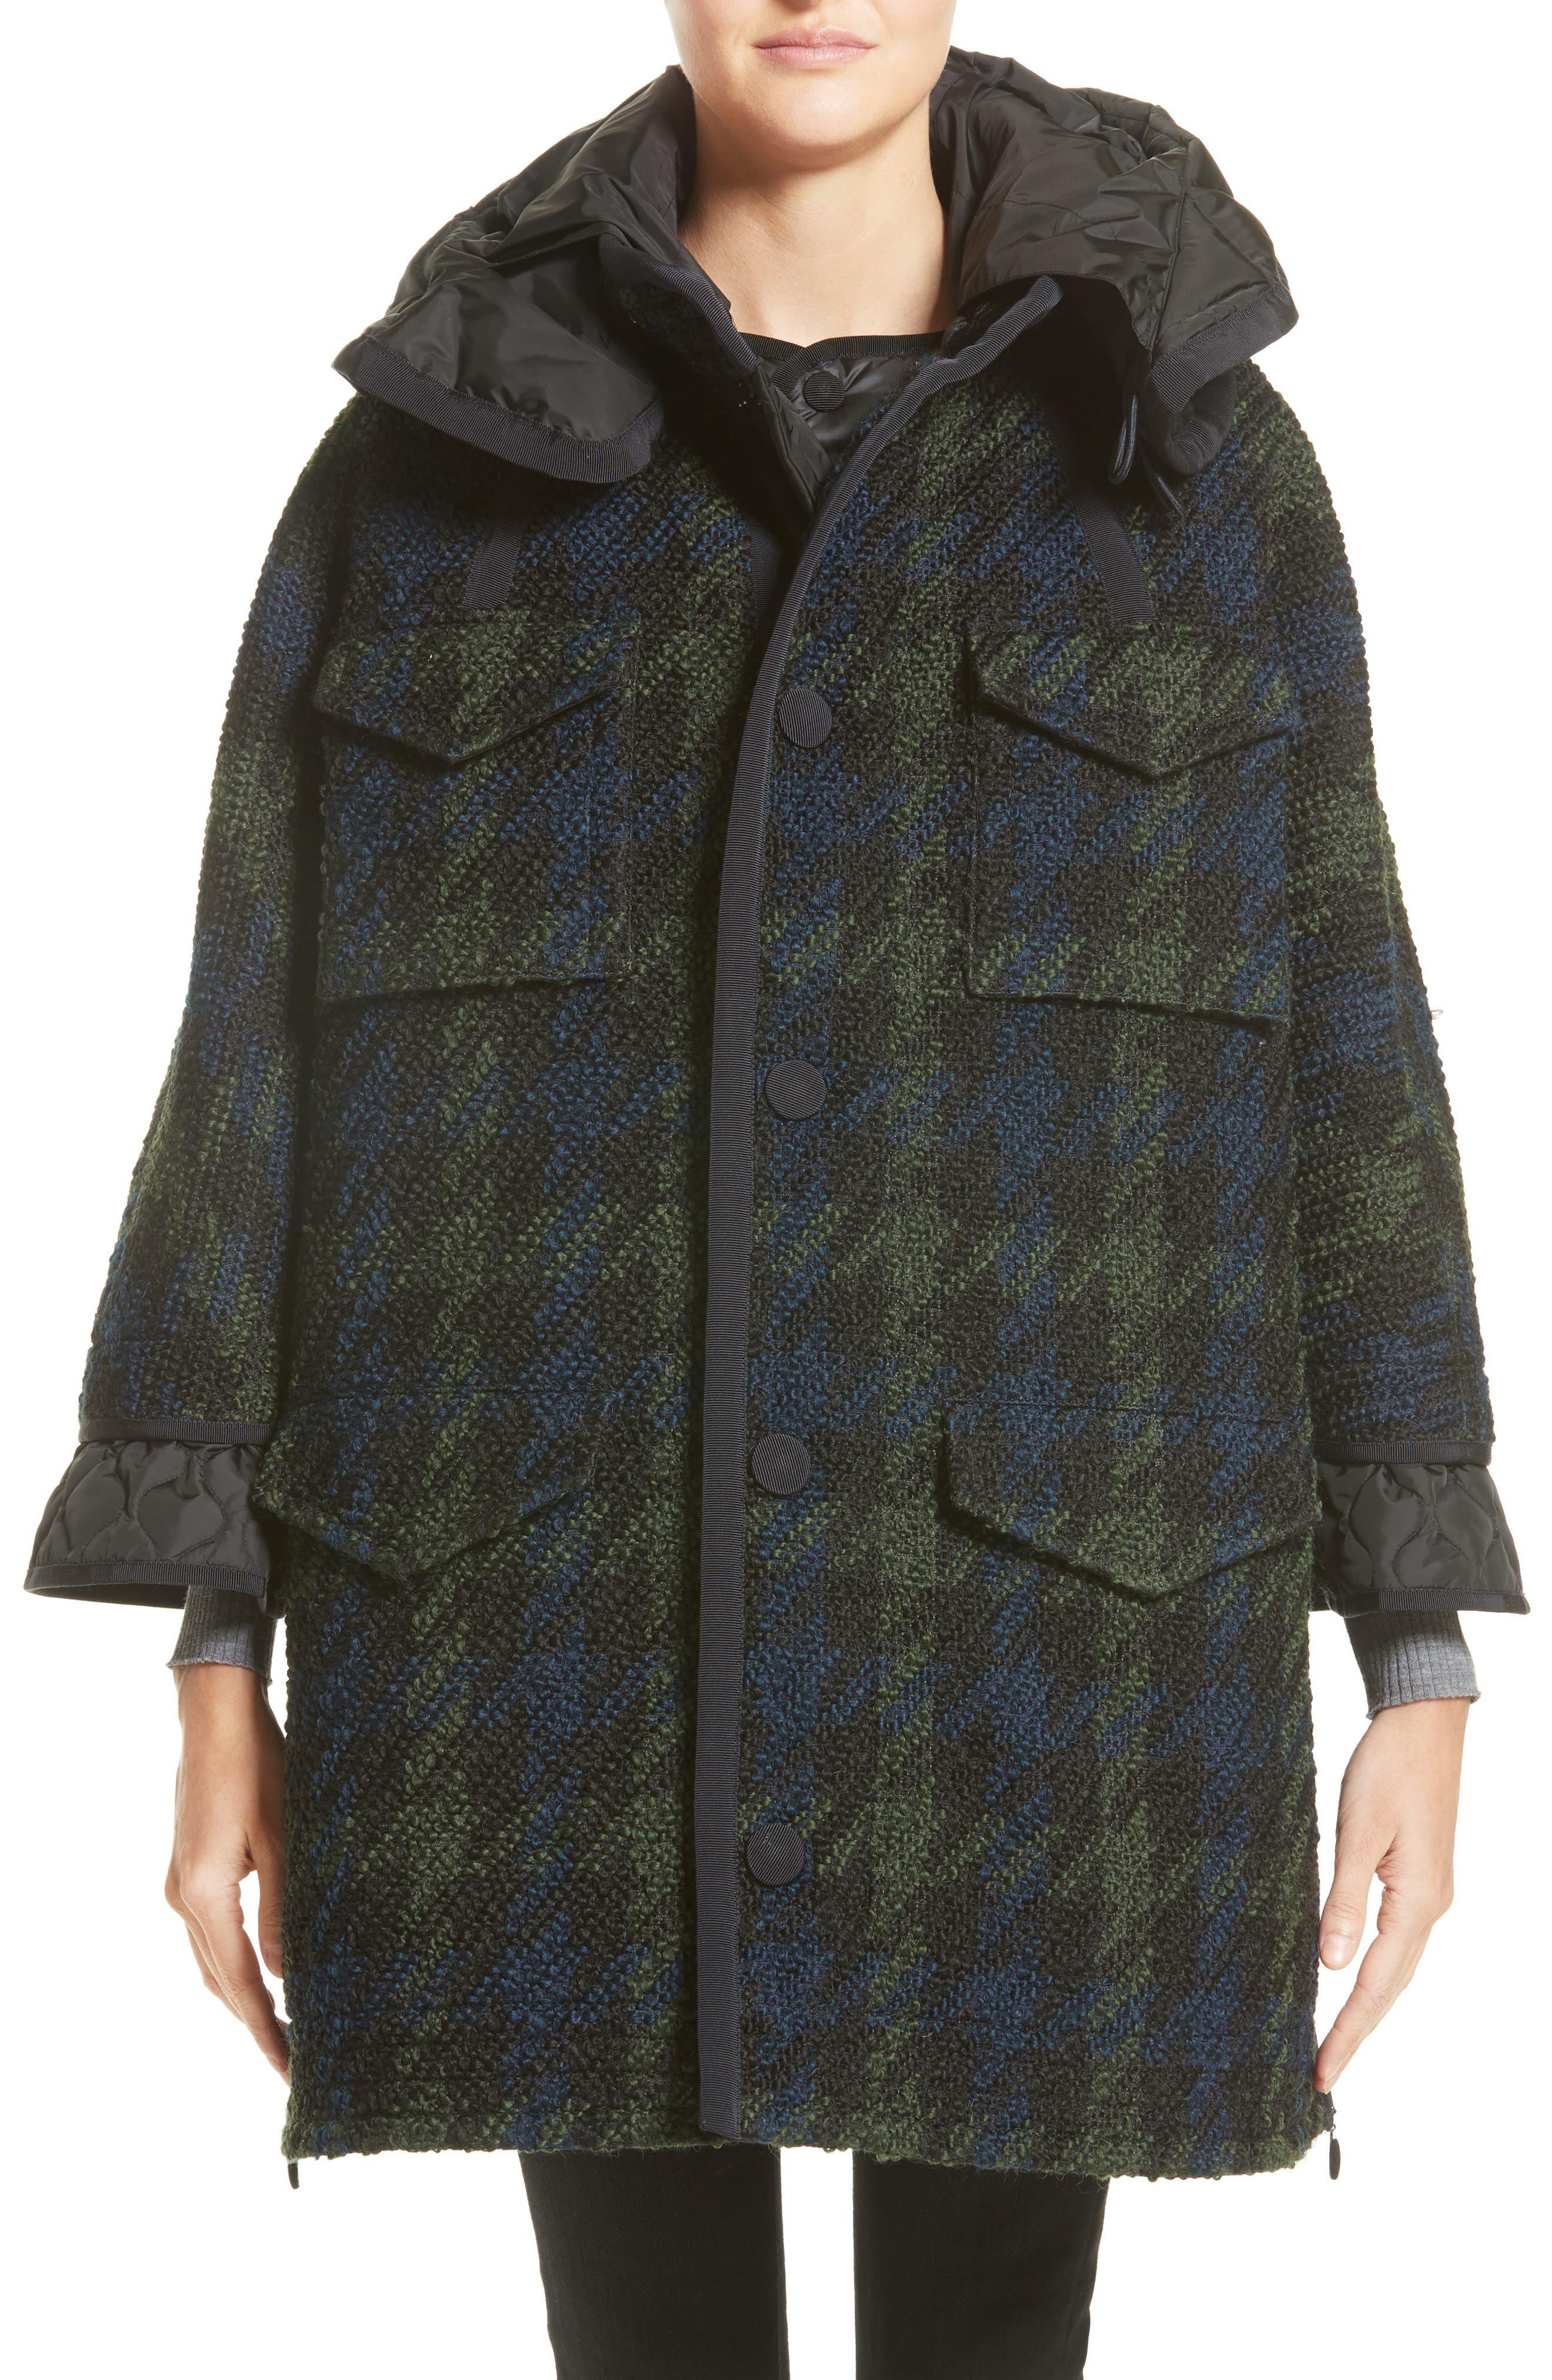 Euphrasie Wool Blend Houndstooth Coat,                         Main,                         color,